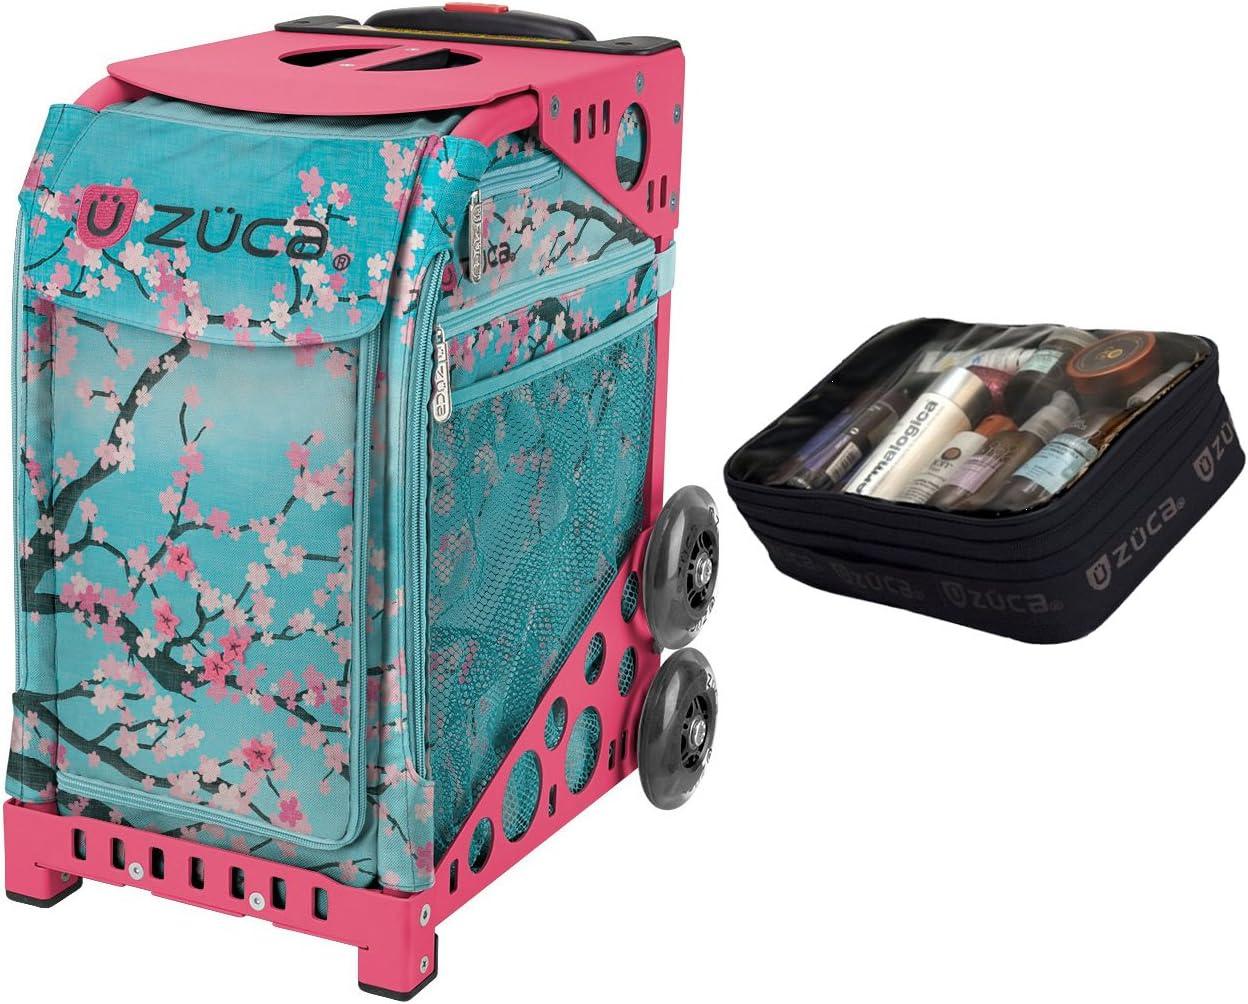 Zuca Hanami Sport Insert Bag /& Pink Frame Gift Utility Pouch